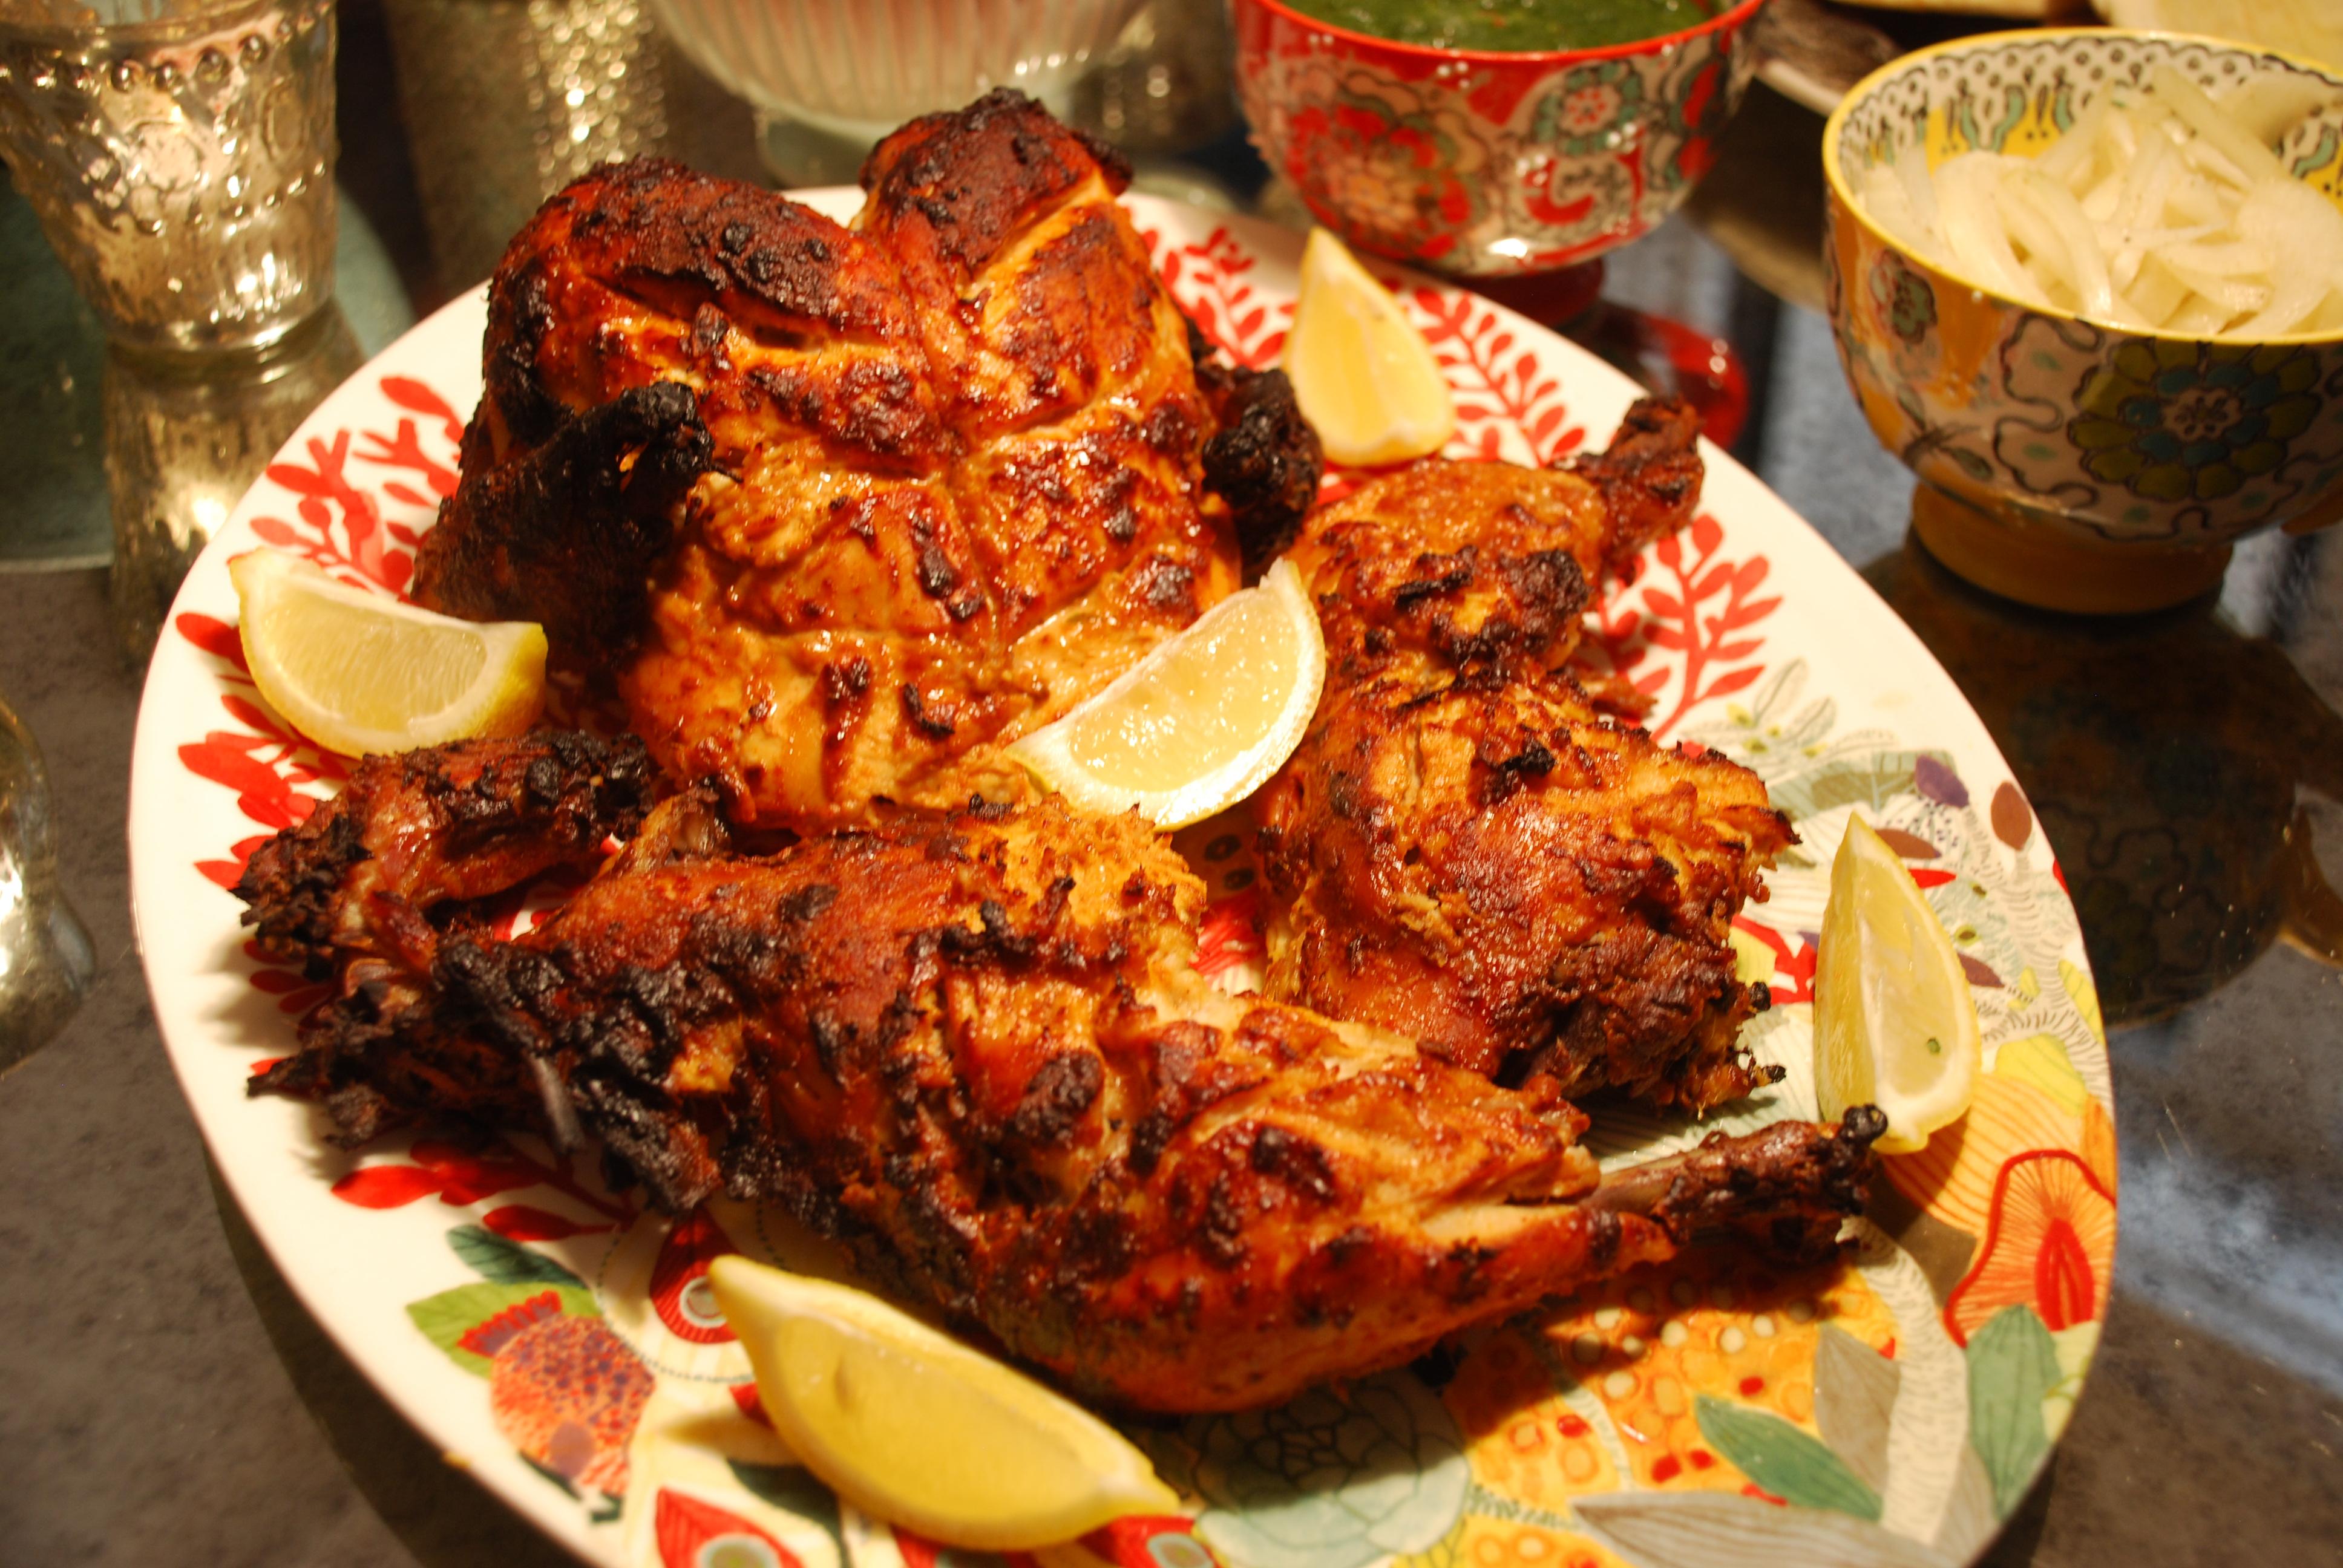 Tandoori kitchen - Dsc_0093 Dsc_0110 Dsc_0123 Dsc_0115 Dsc_0128 Tandoori Chicken